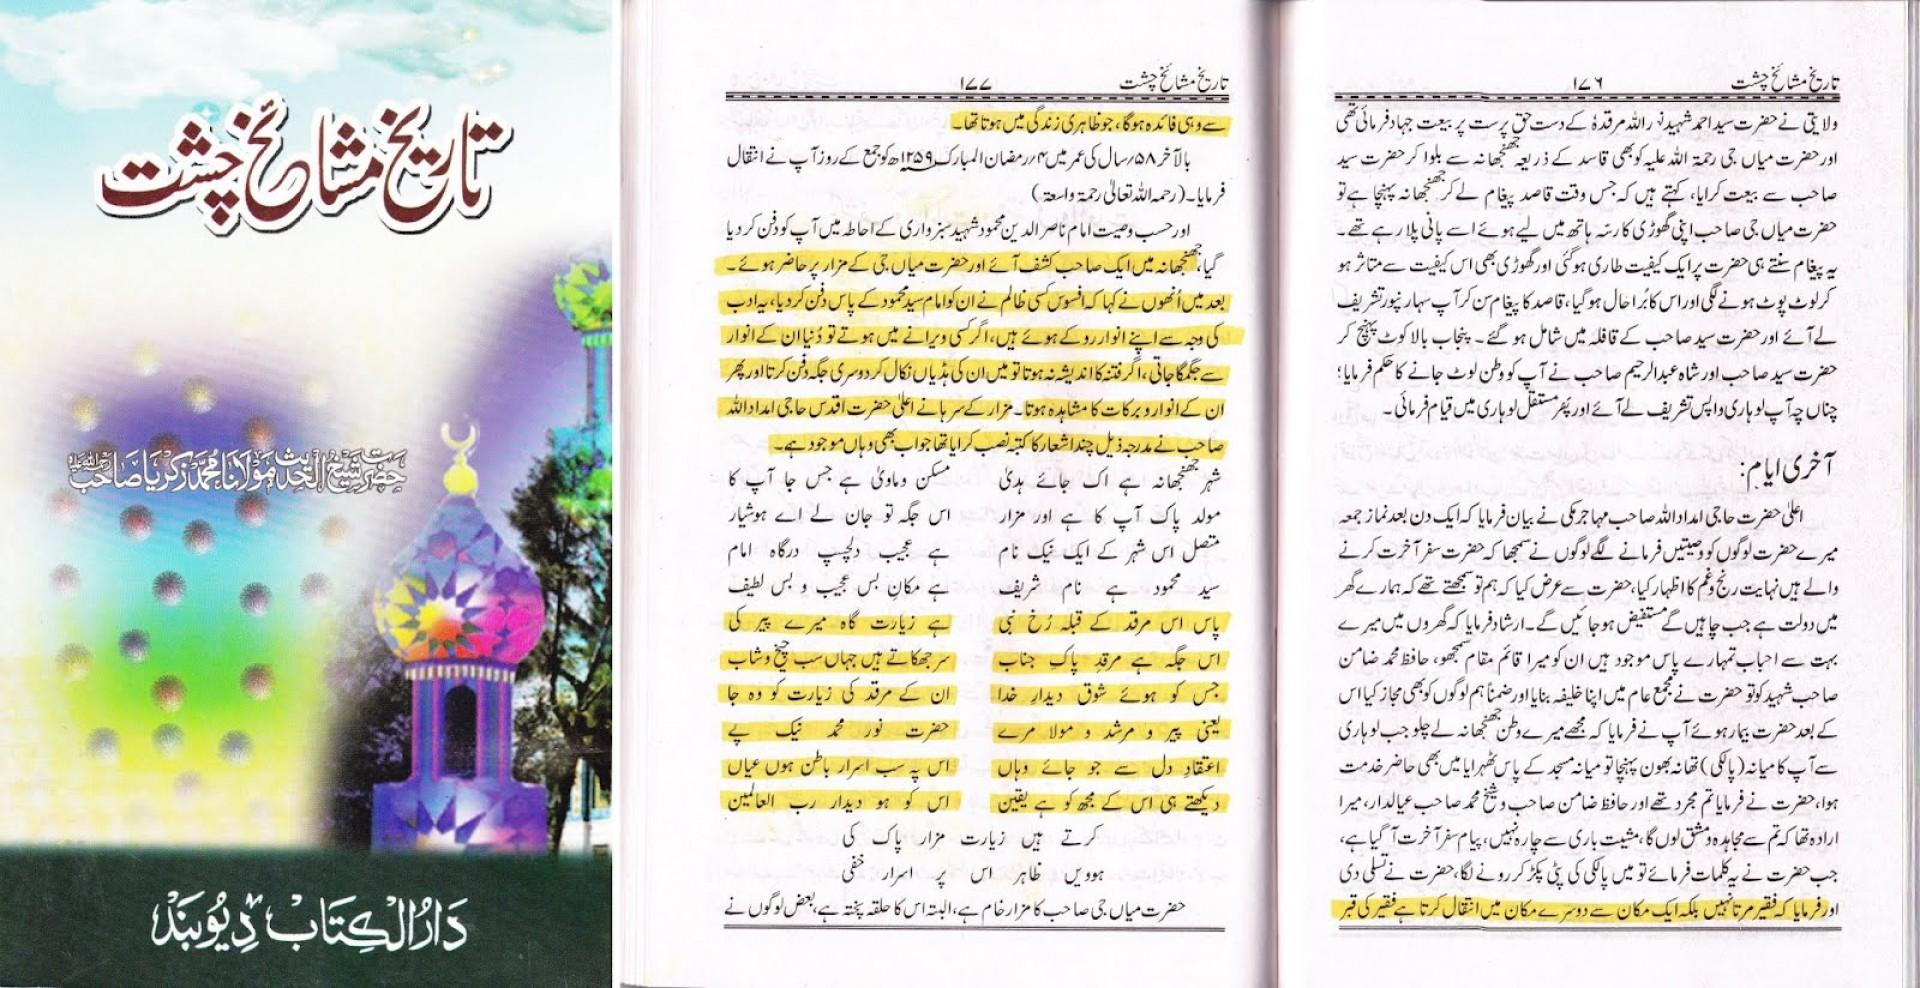 011 478849 261640603926412 100002414243345 528737 34028248 O Essay Example Harkat Mein Barkat In Amazing Urdu On Topic Hai Short 1920